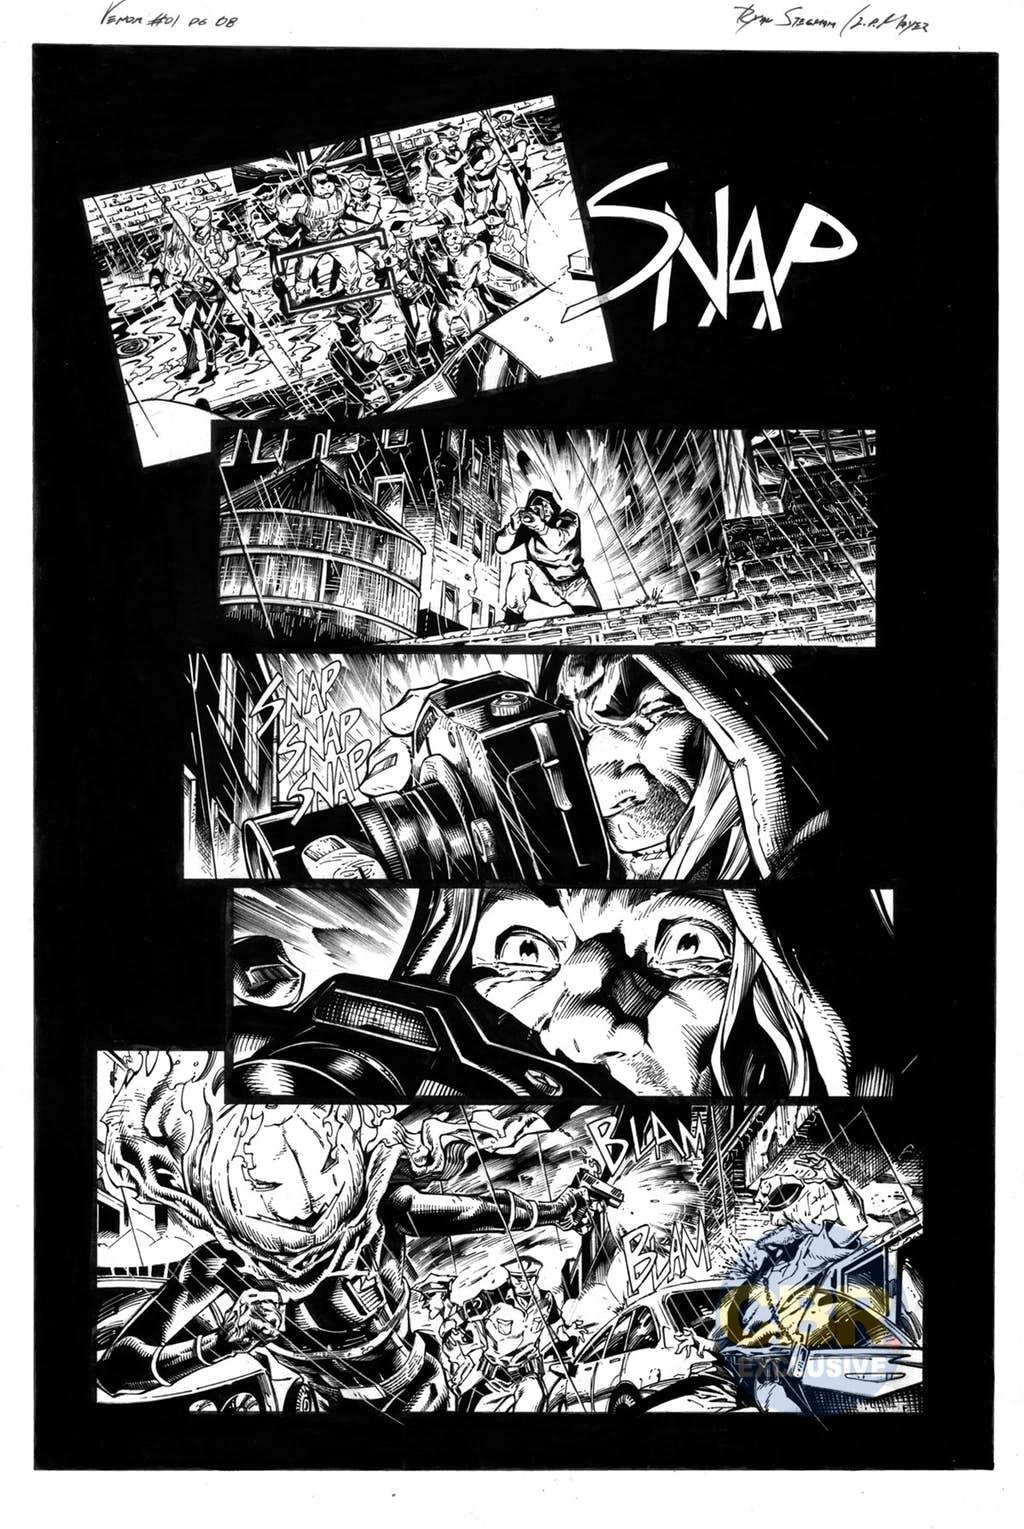 Venom #1, anteprima 05 (chine)